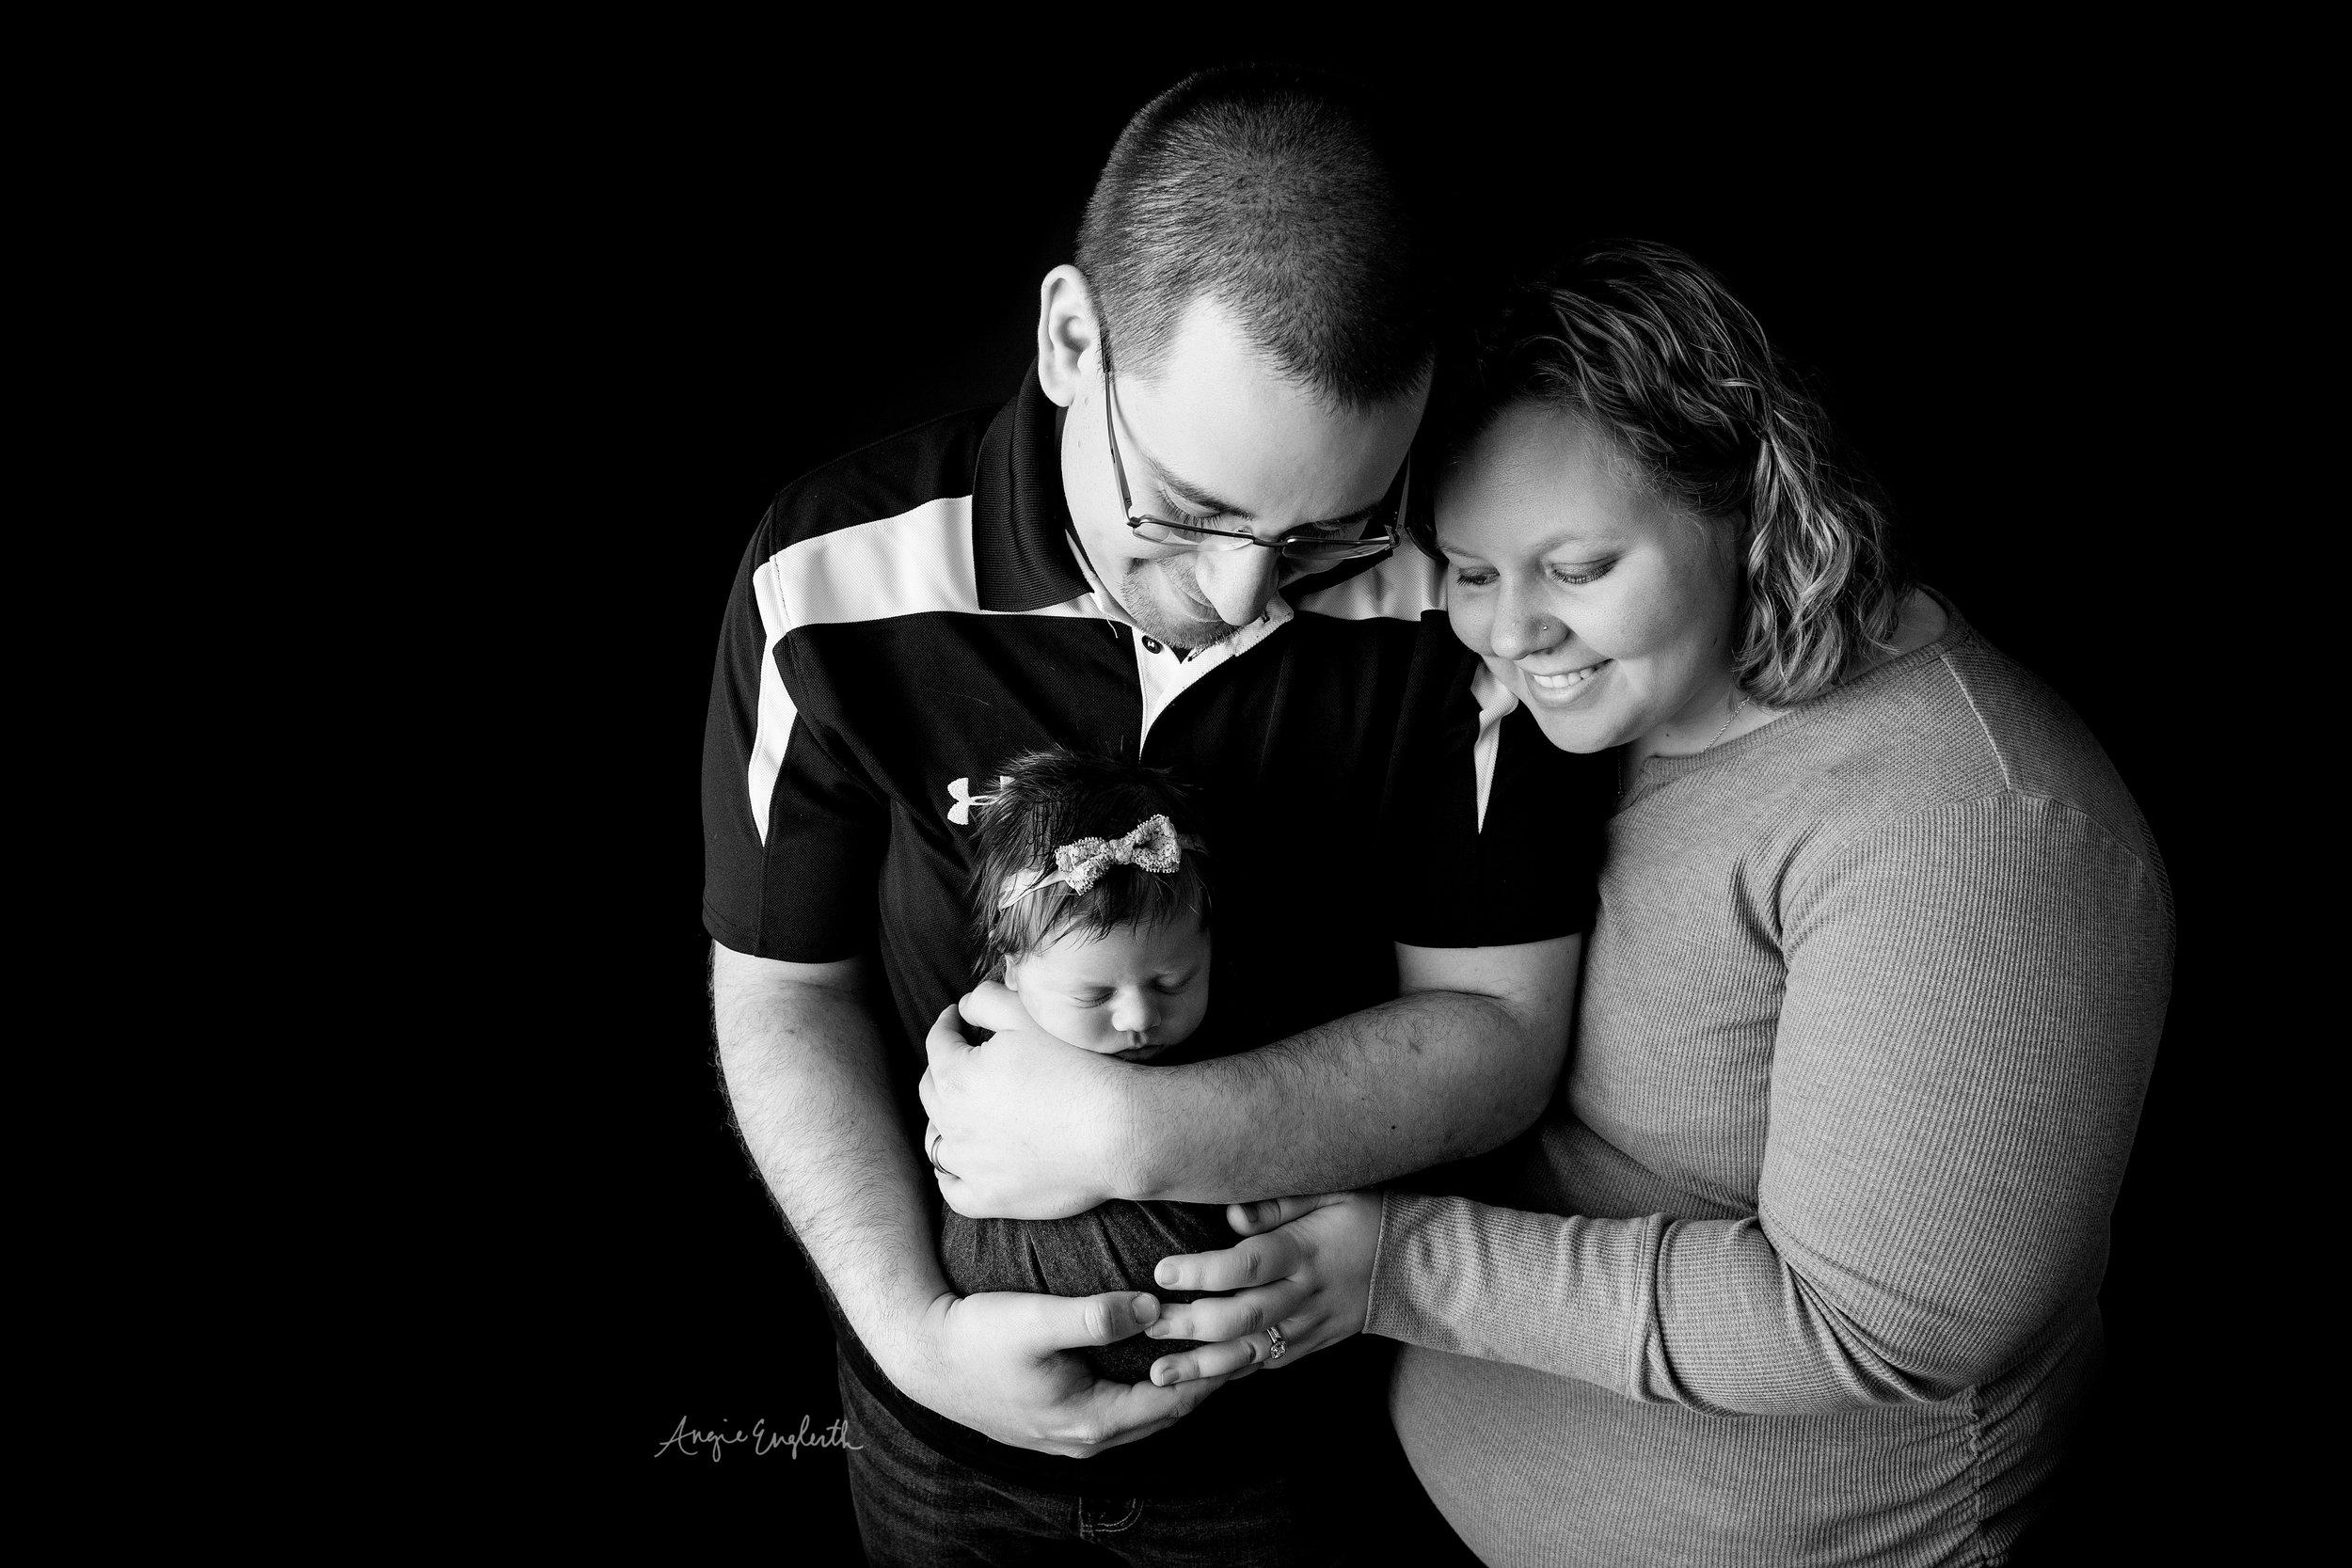 Lancaster_Newborn_Photographer_Angie_Englerth_Jenna_014.jpg